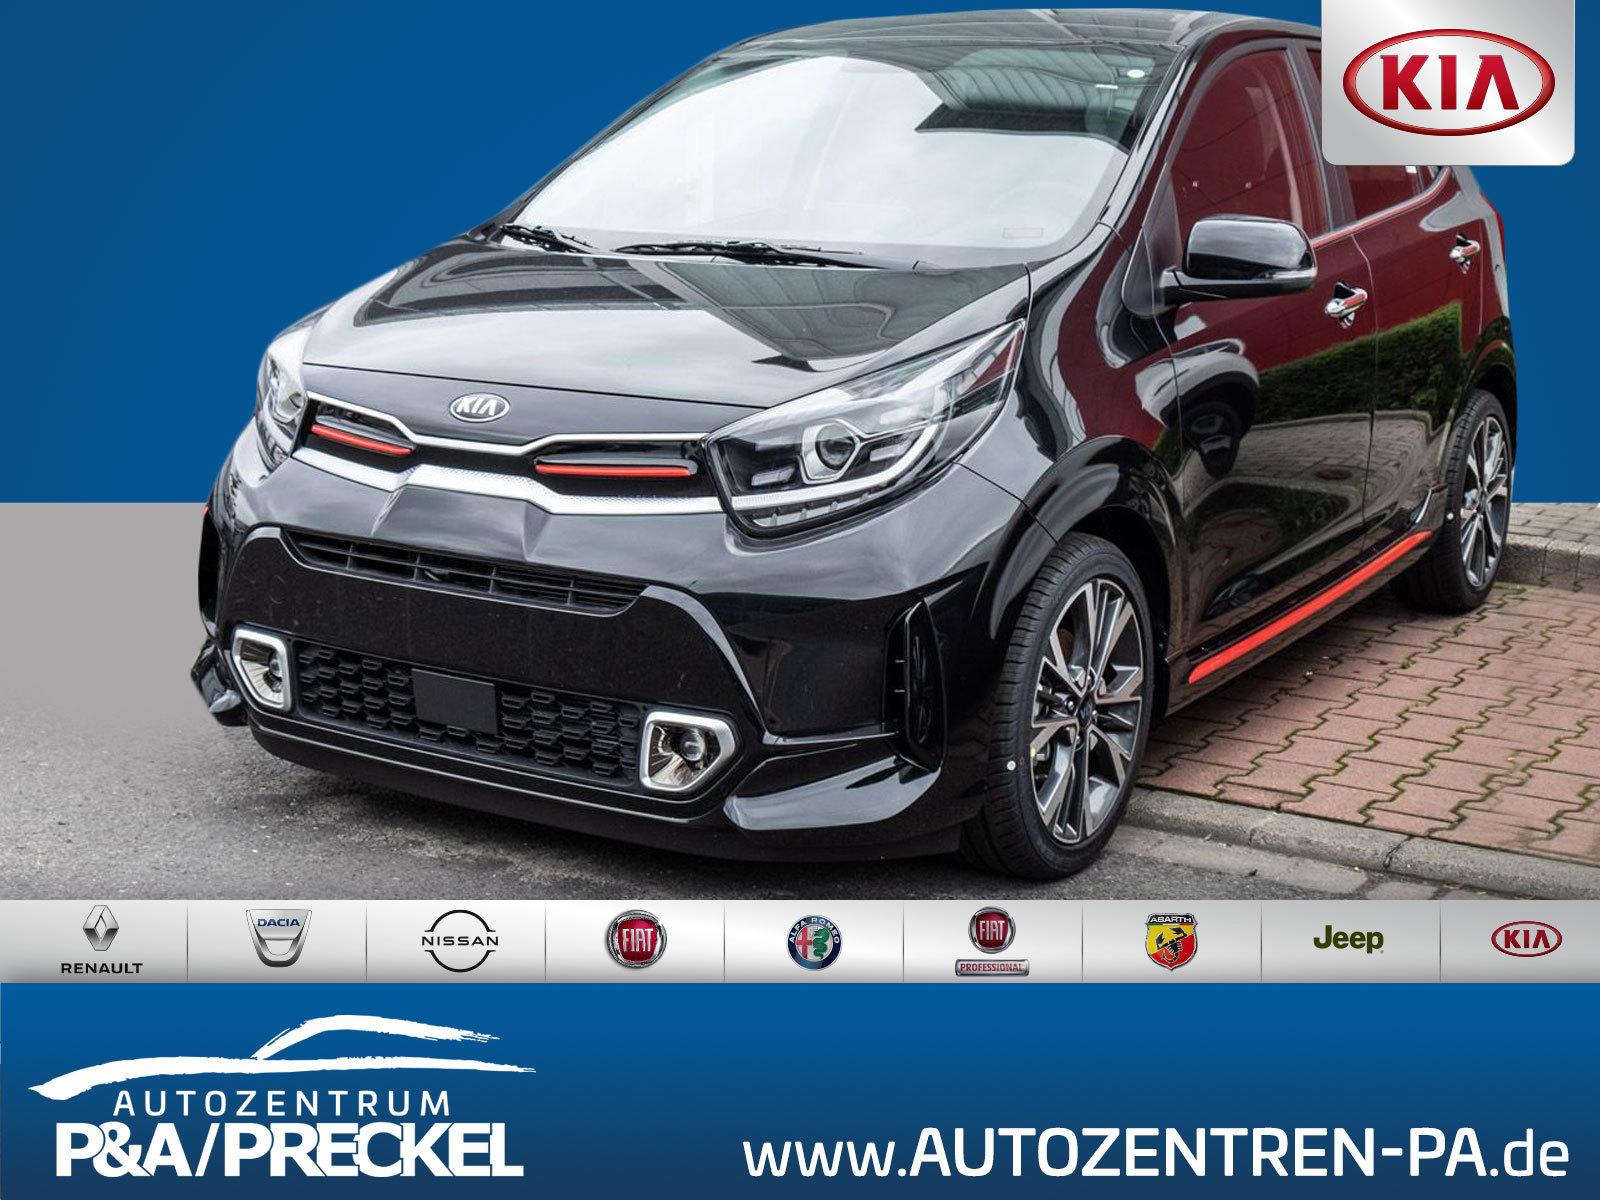 Kia Picanto GT-Line 1.2 / Navi / Technology-Paket, Jahr 2021, Benzin